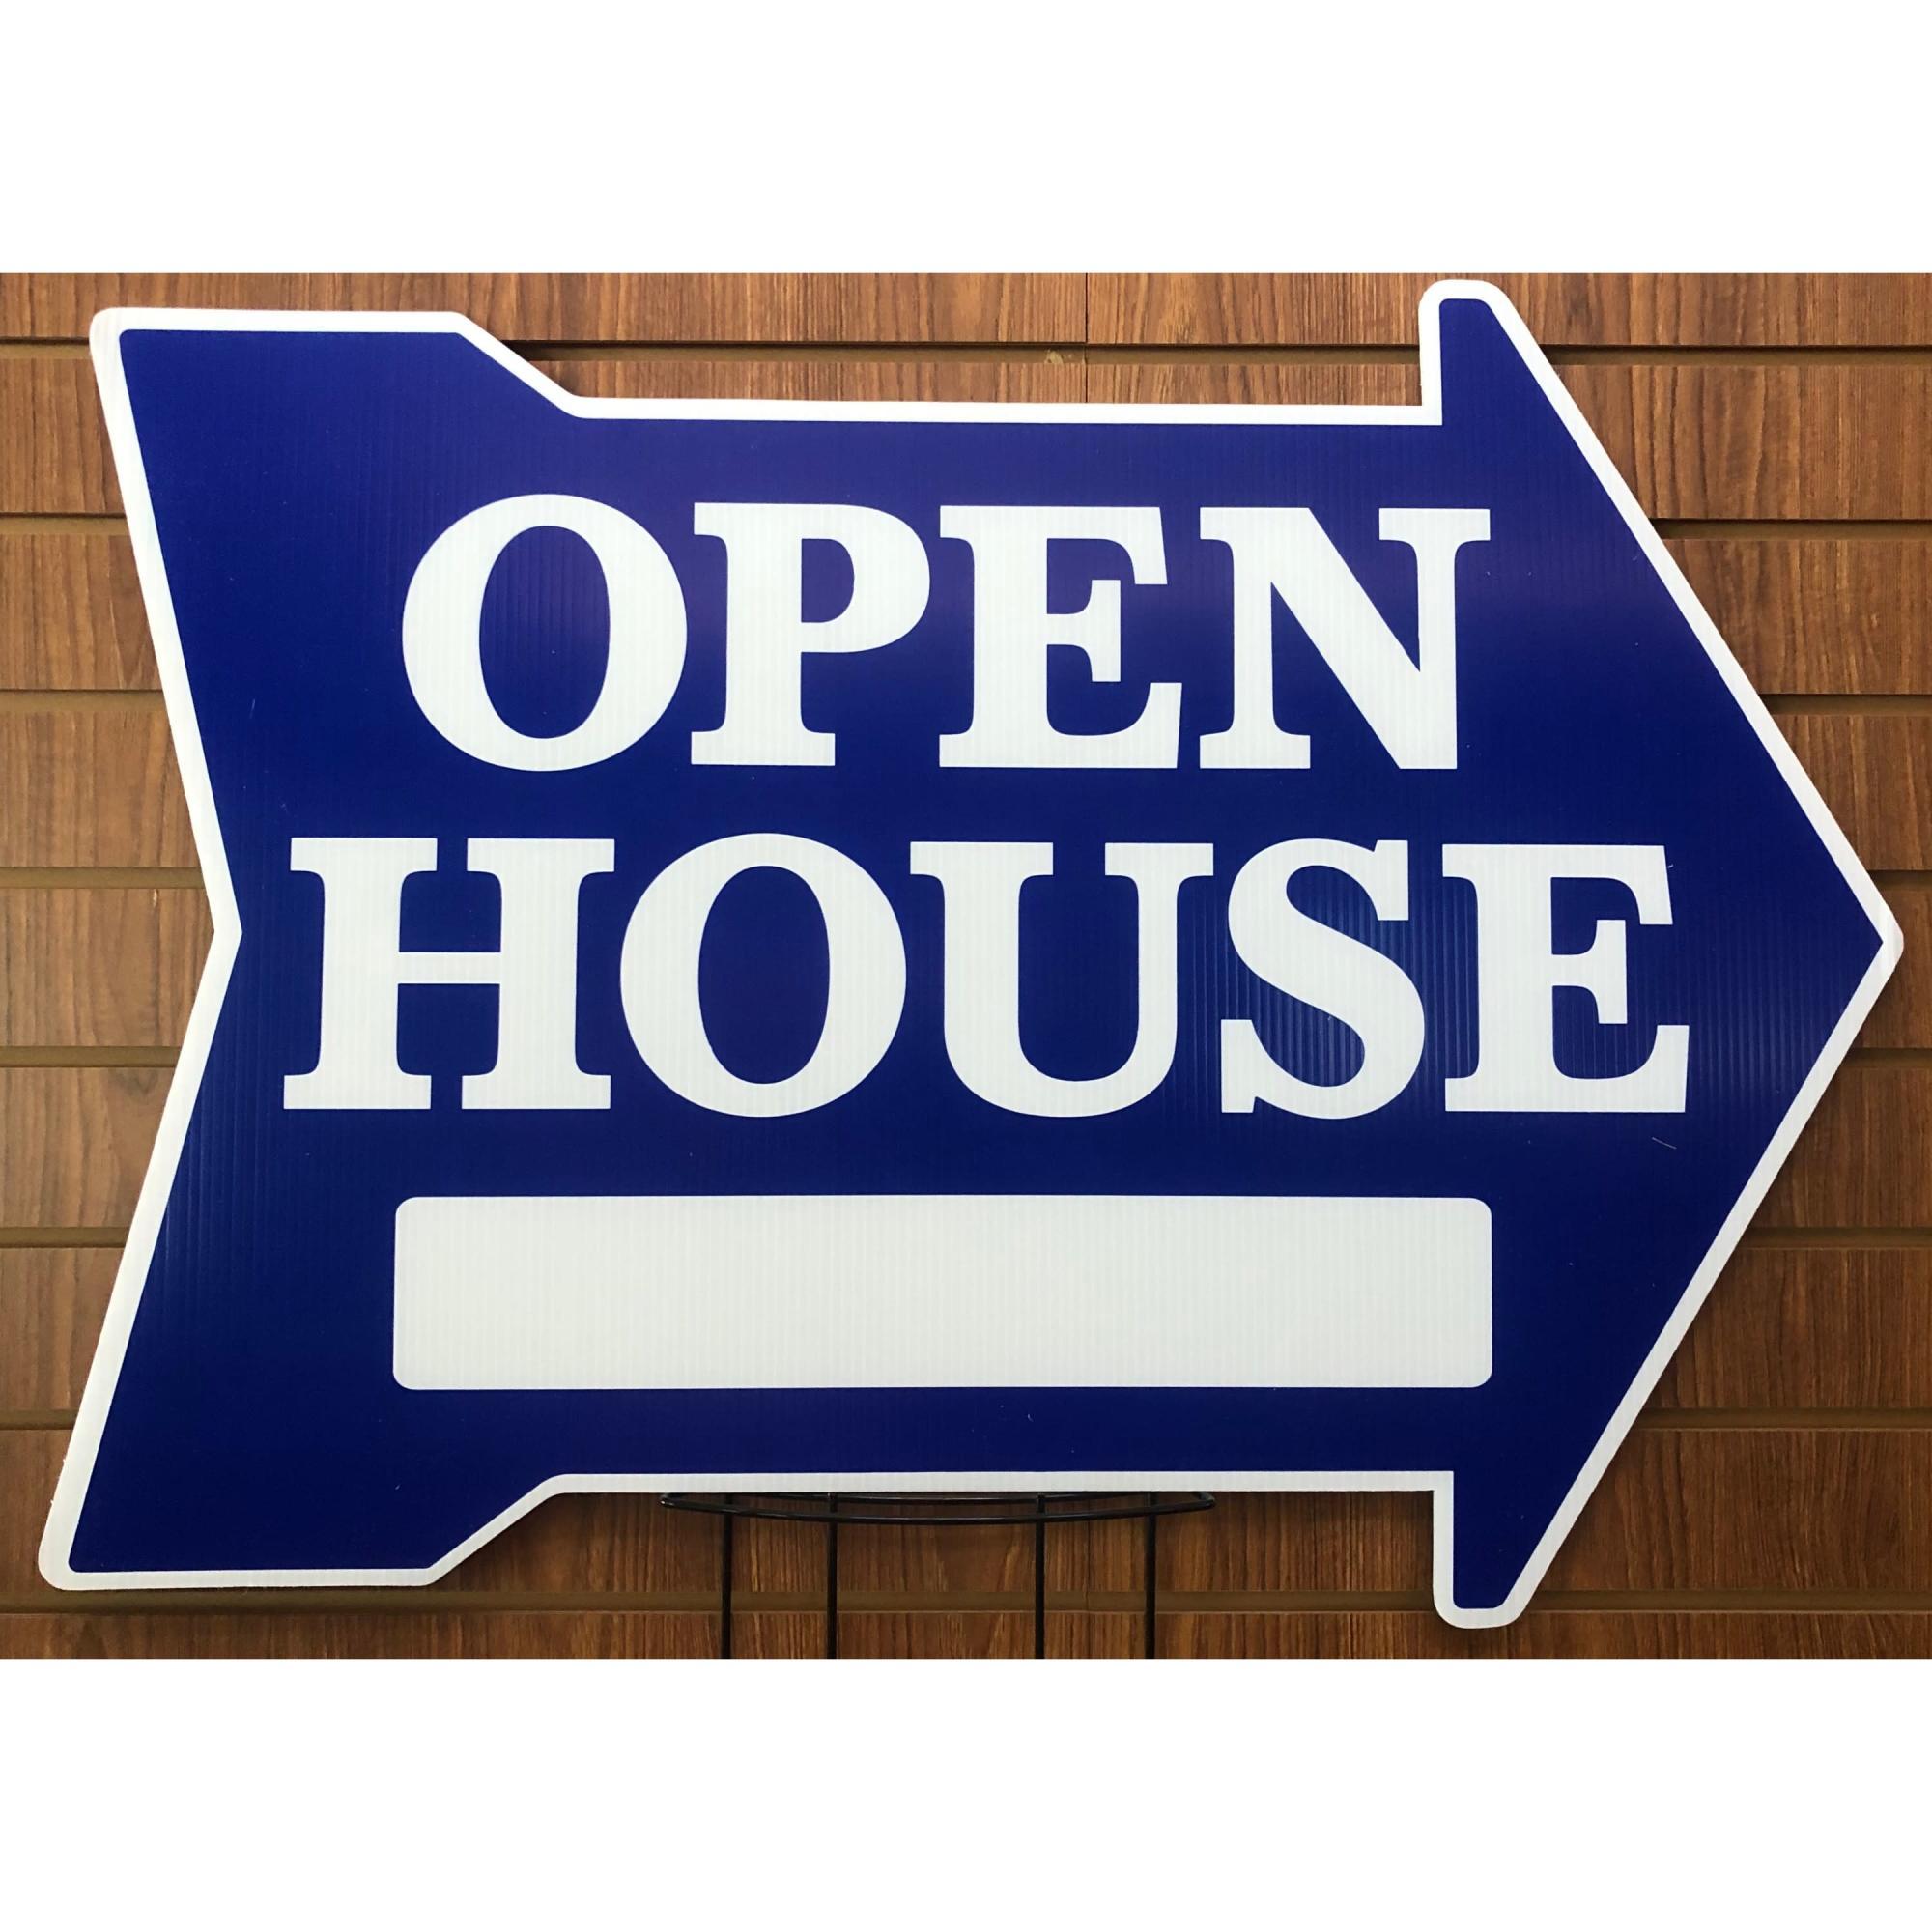 EXTRA LARGE Open House ___ -- Arrow Shape BLUE provided by WCREALTORS